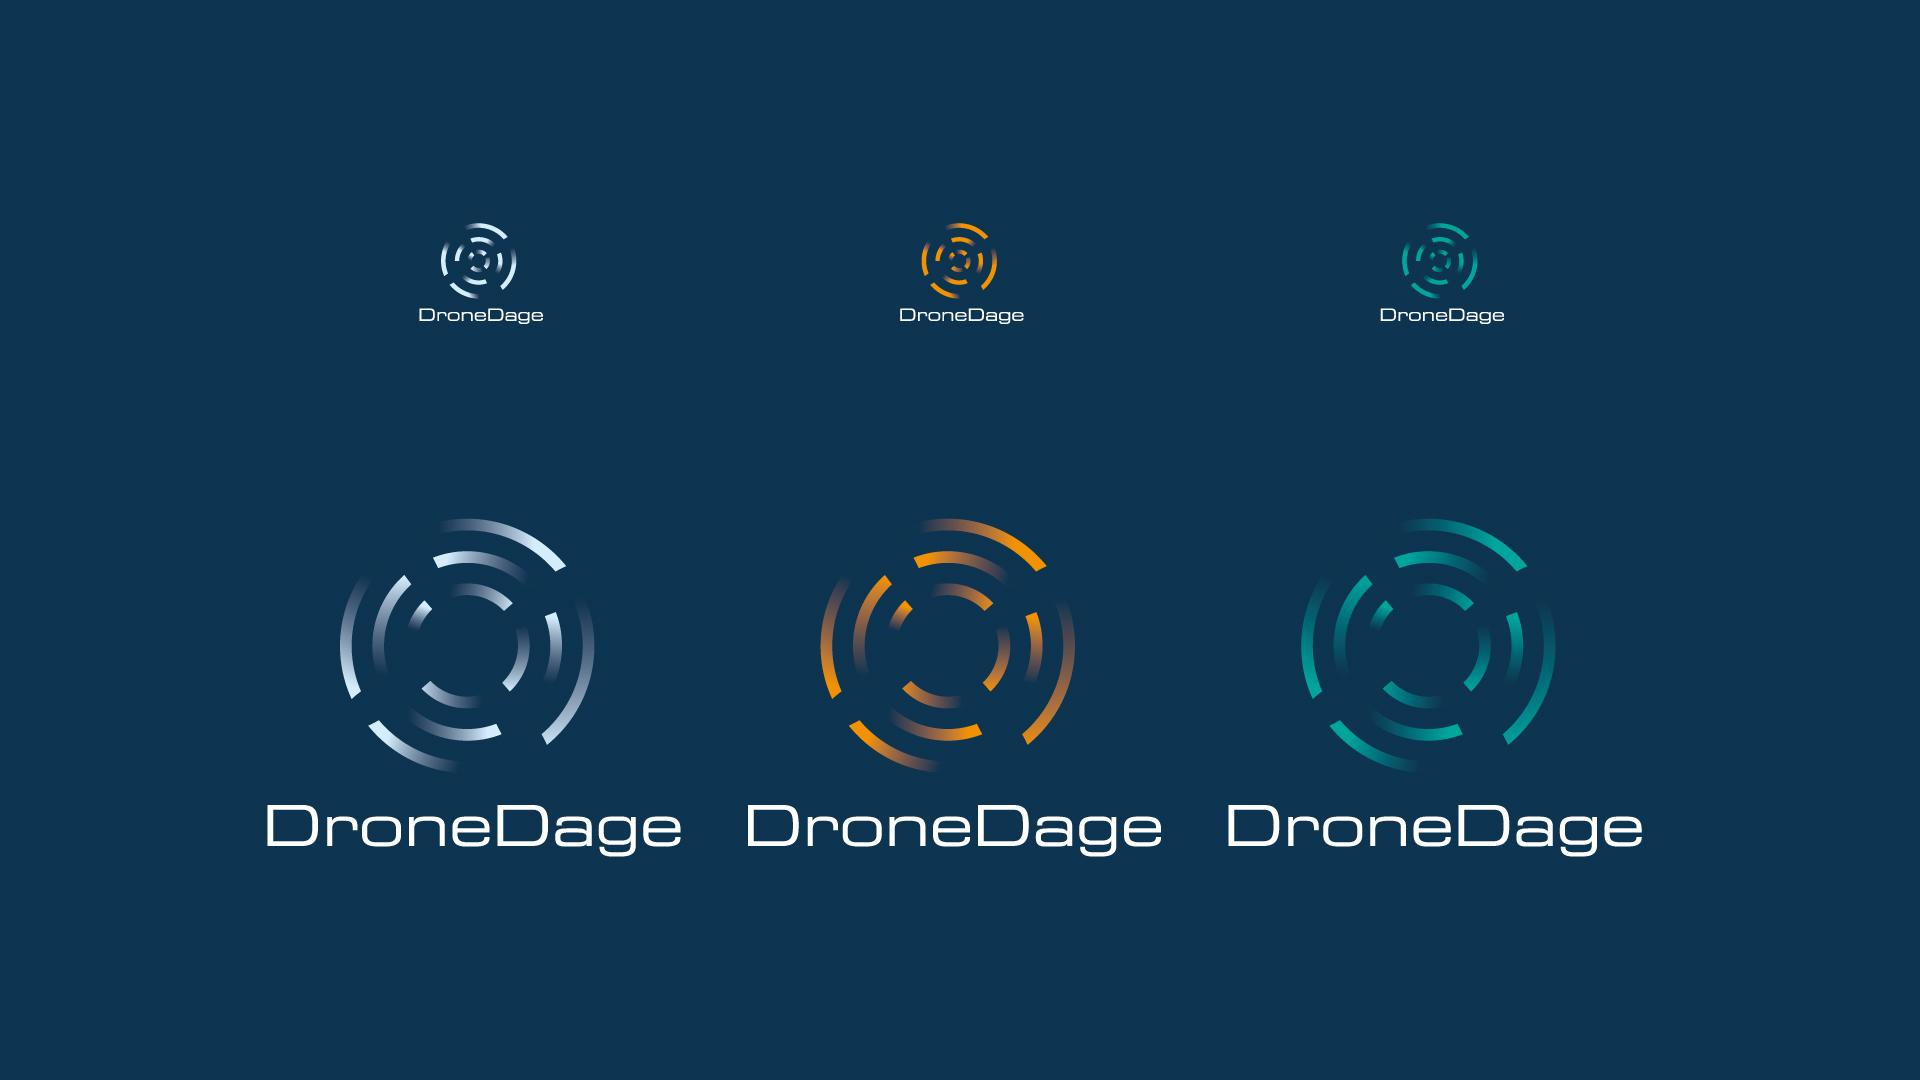 dronedage_philipjohansen_logos